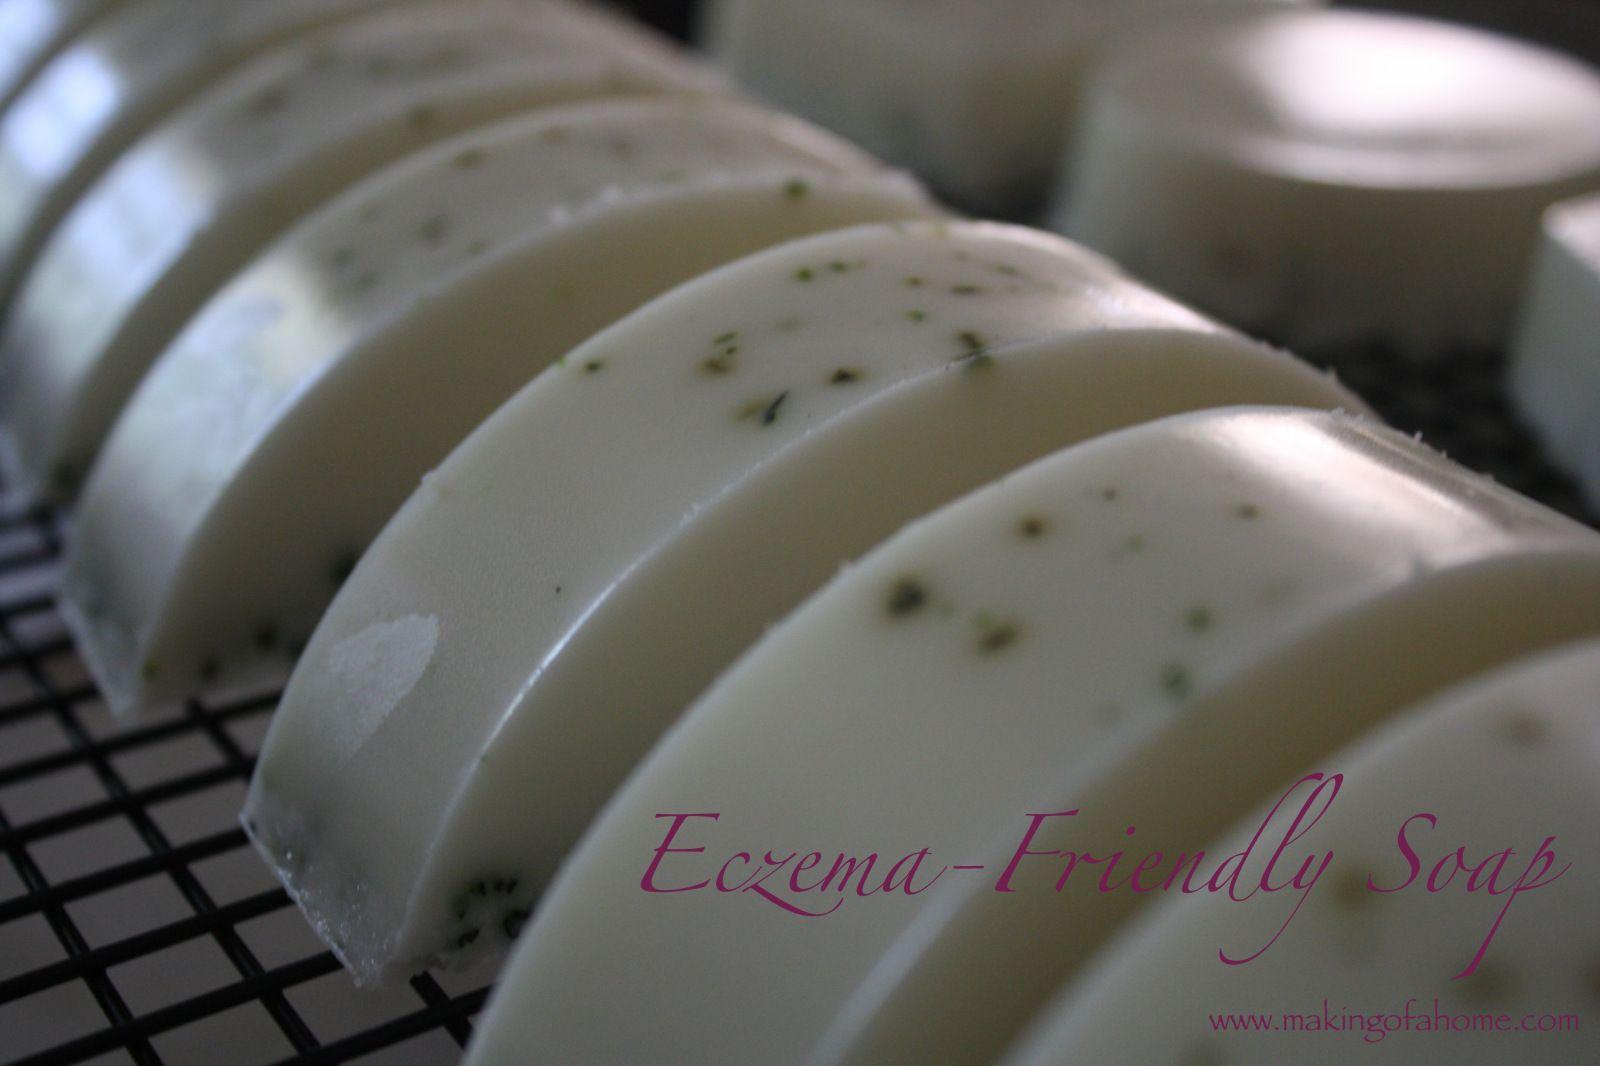 EczemaFriendly Soap Soap recipes, Soap making recipes